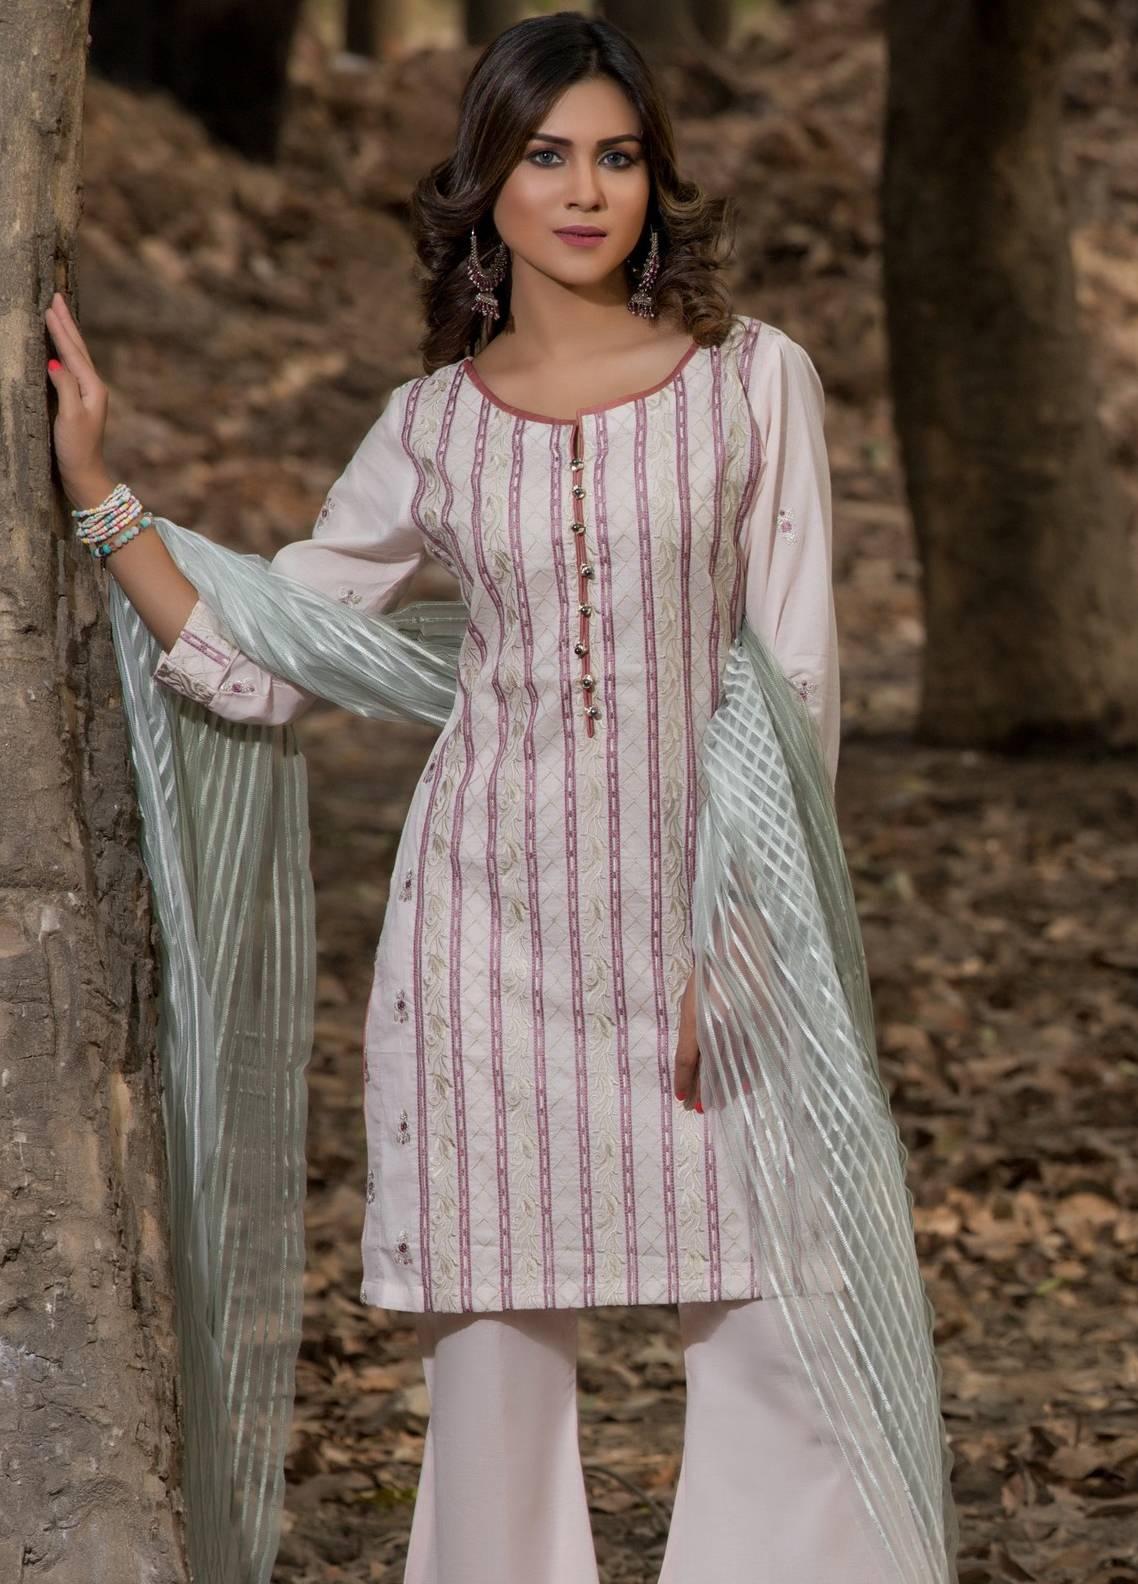 b4594b5334 Sahil by ZS Textiles Embroidered Lawn Unstitched 3 Piece Suit SL18-L5 08 -  Eid Collection